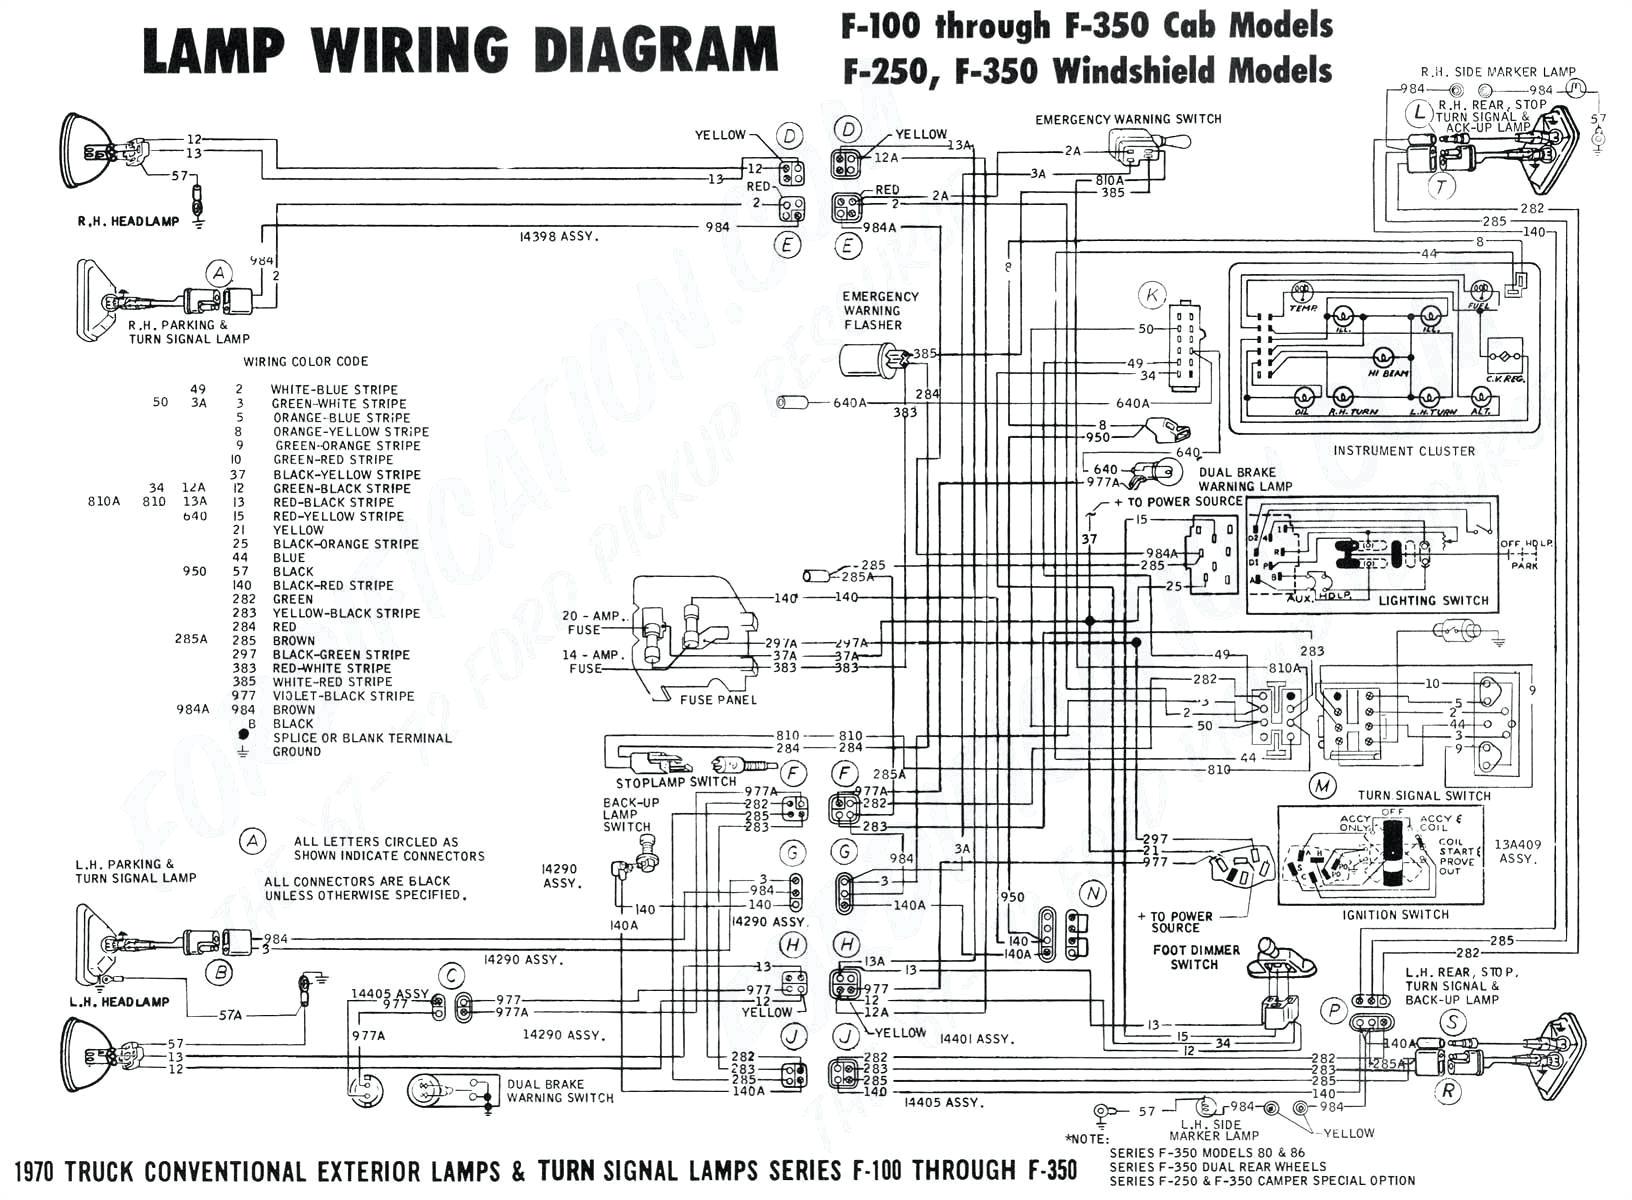 wiring diagram 1994 acura integra wiring diagram paper 1994 acura integra stereo wiring diagram 1994 acura